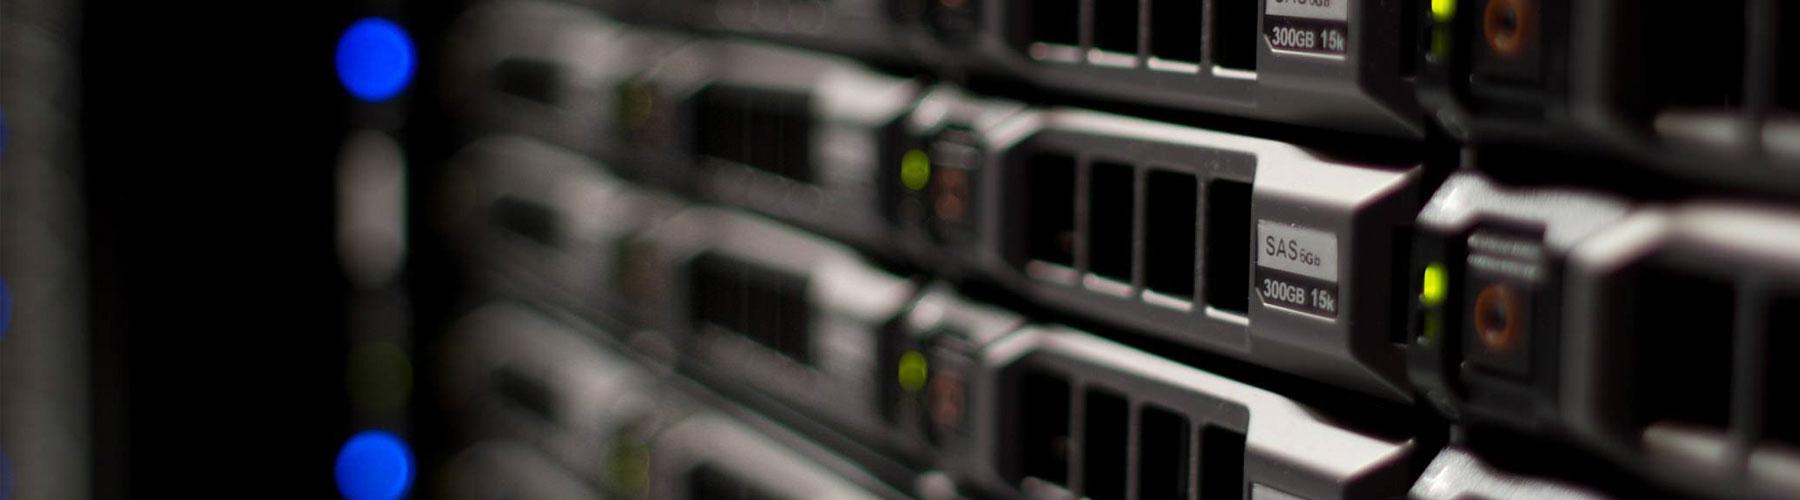 Flaweless Websites Hosting Services